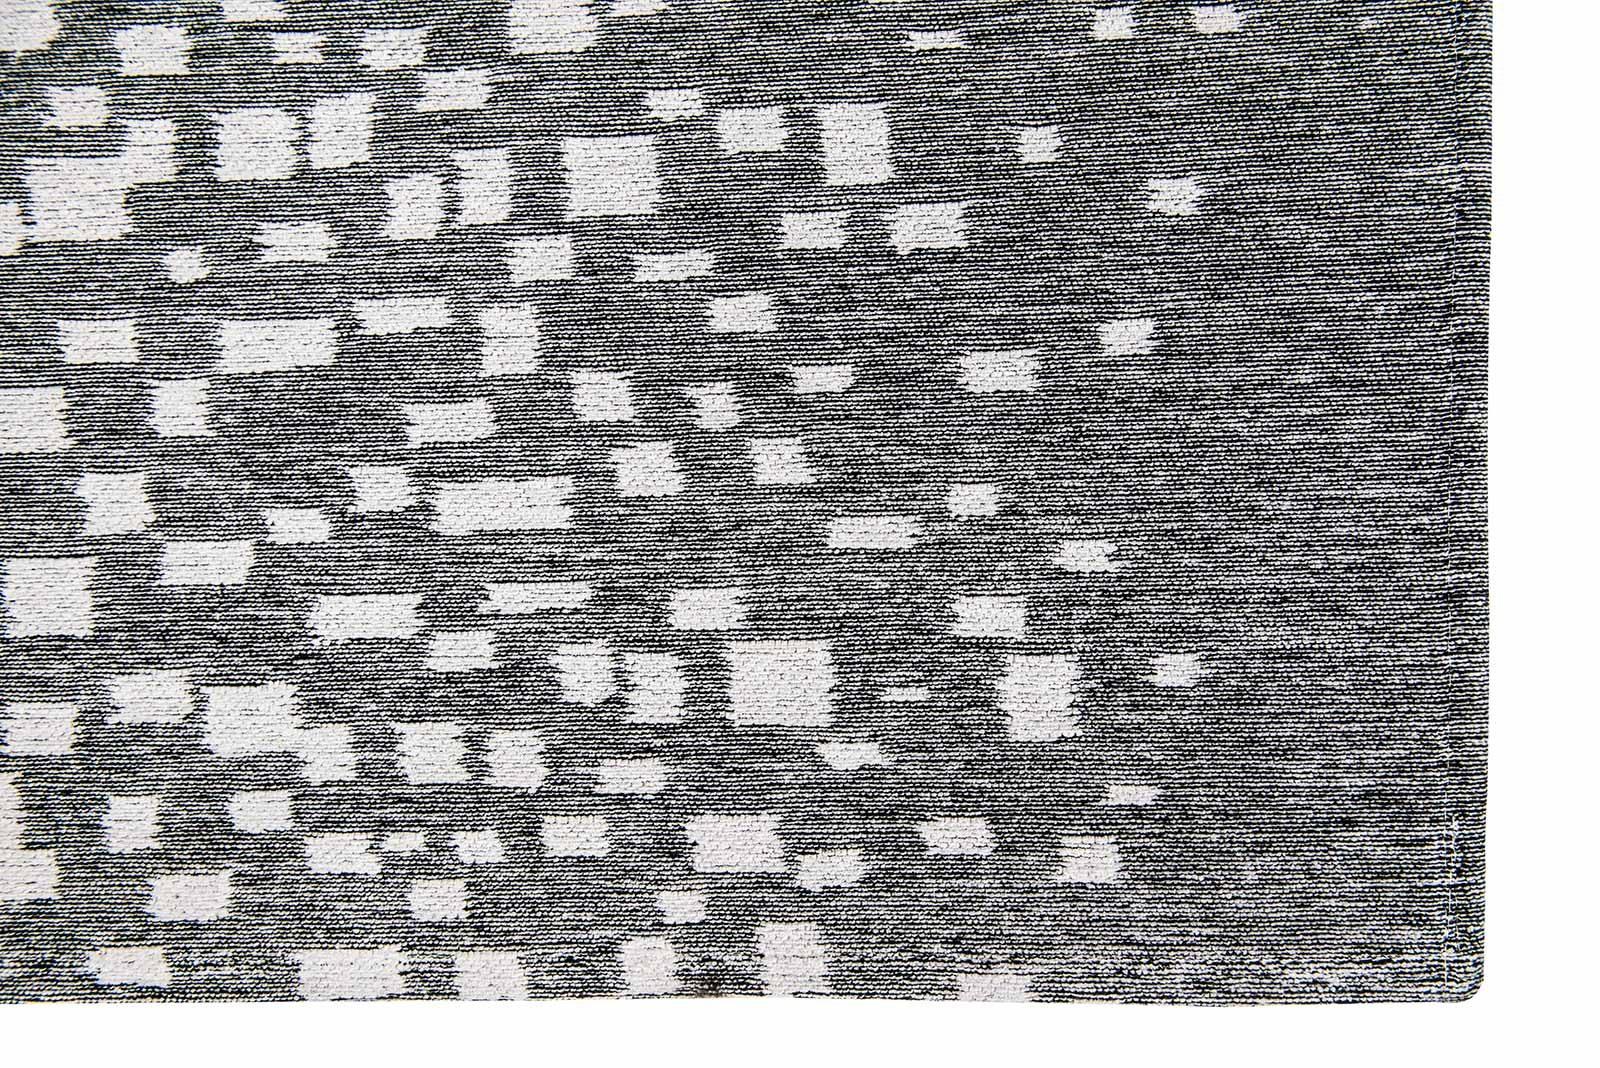 Louis De Poortere alfombras Villa Nova LX 8779 Freyr Carbon corner